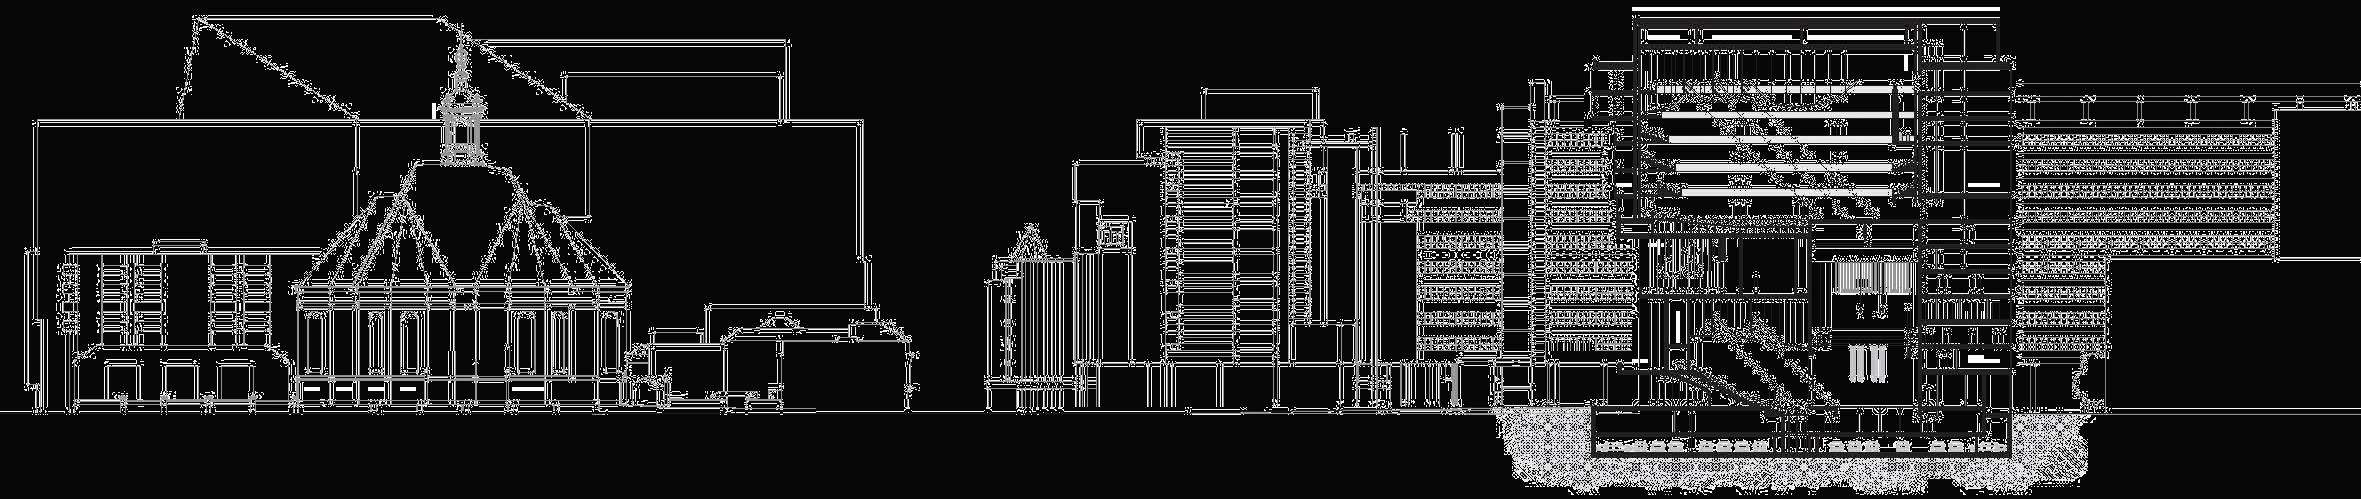 Dmc the hague powerhouse company dmc the hague blueprint malvernweather Choice Image